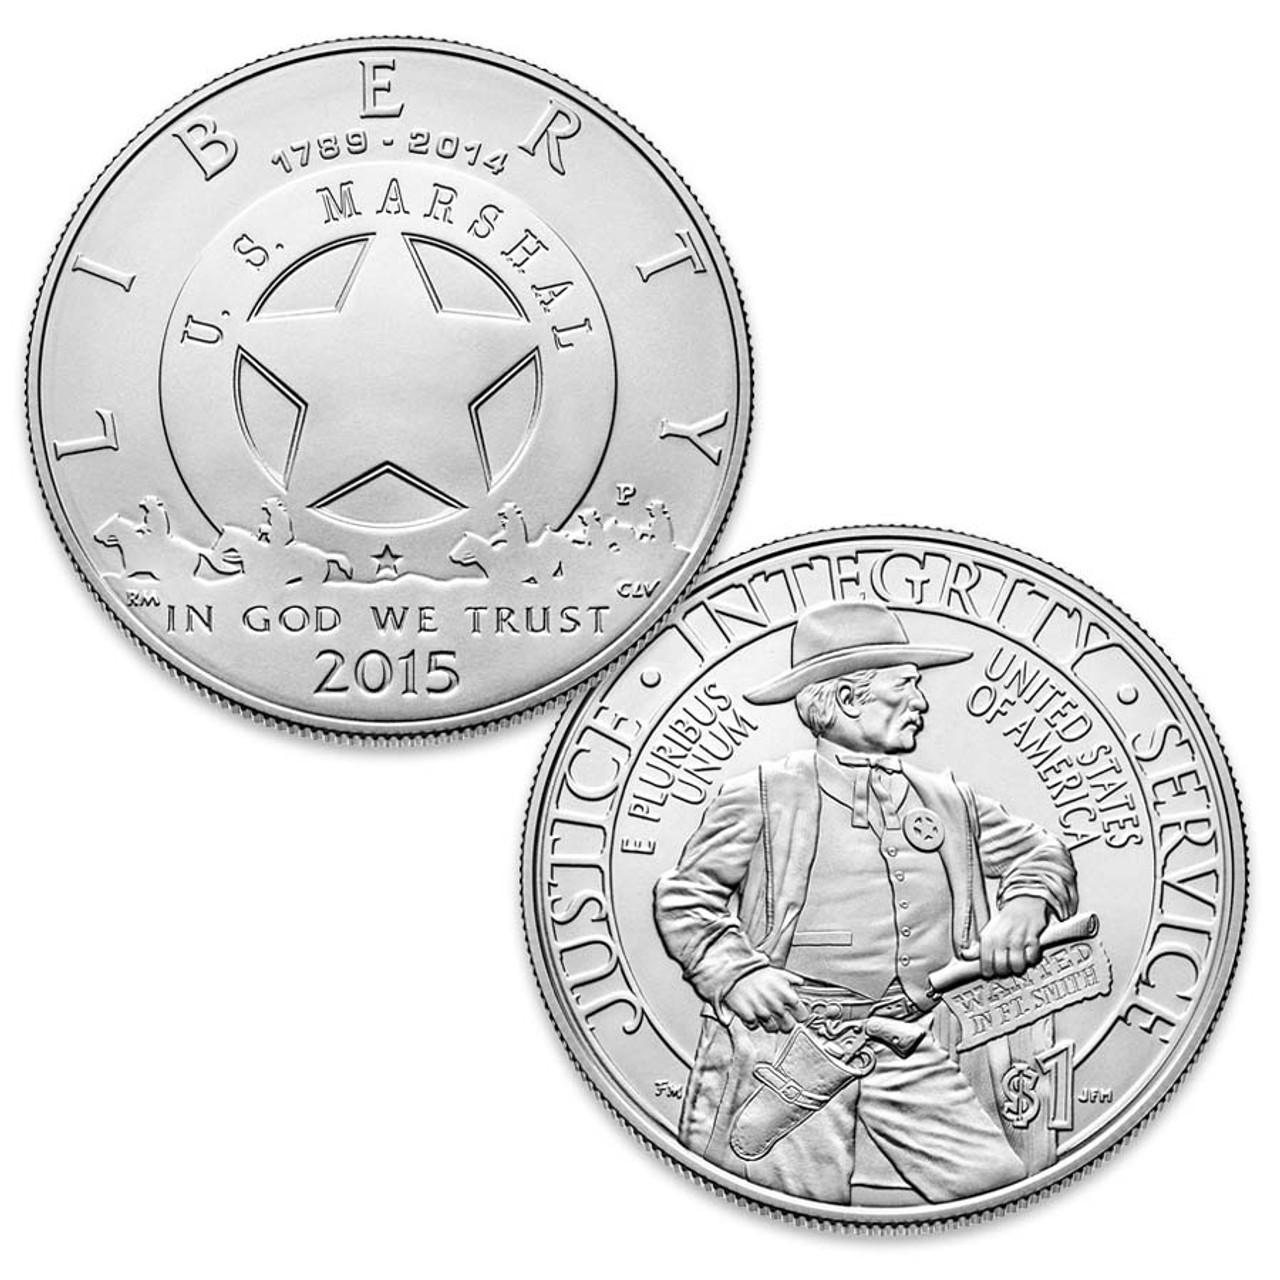 2015 Marshals Service Silver Dollar Brilliant Uncirculated